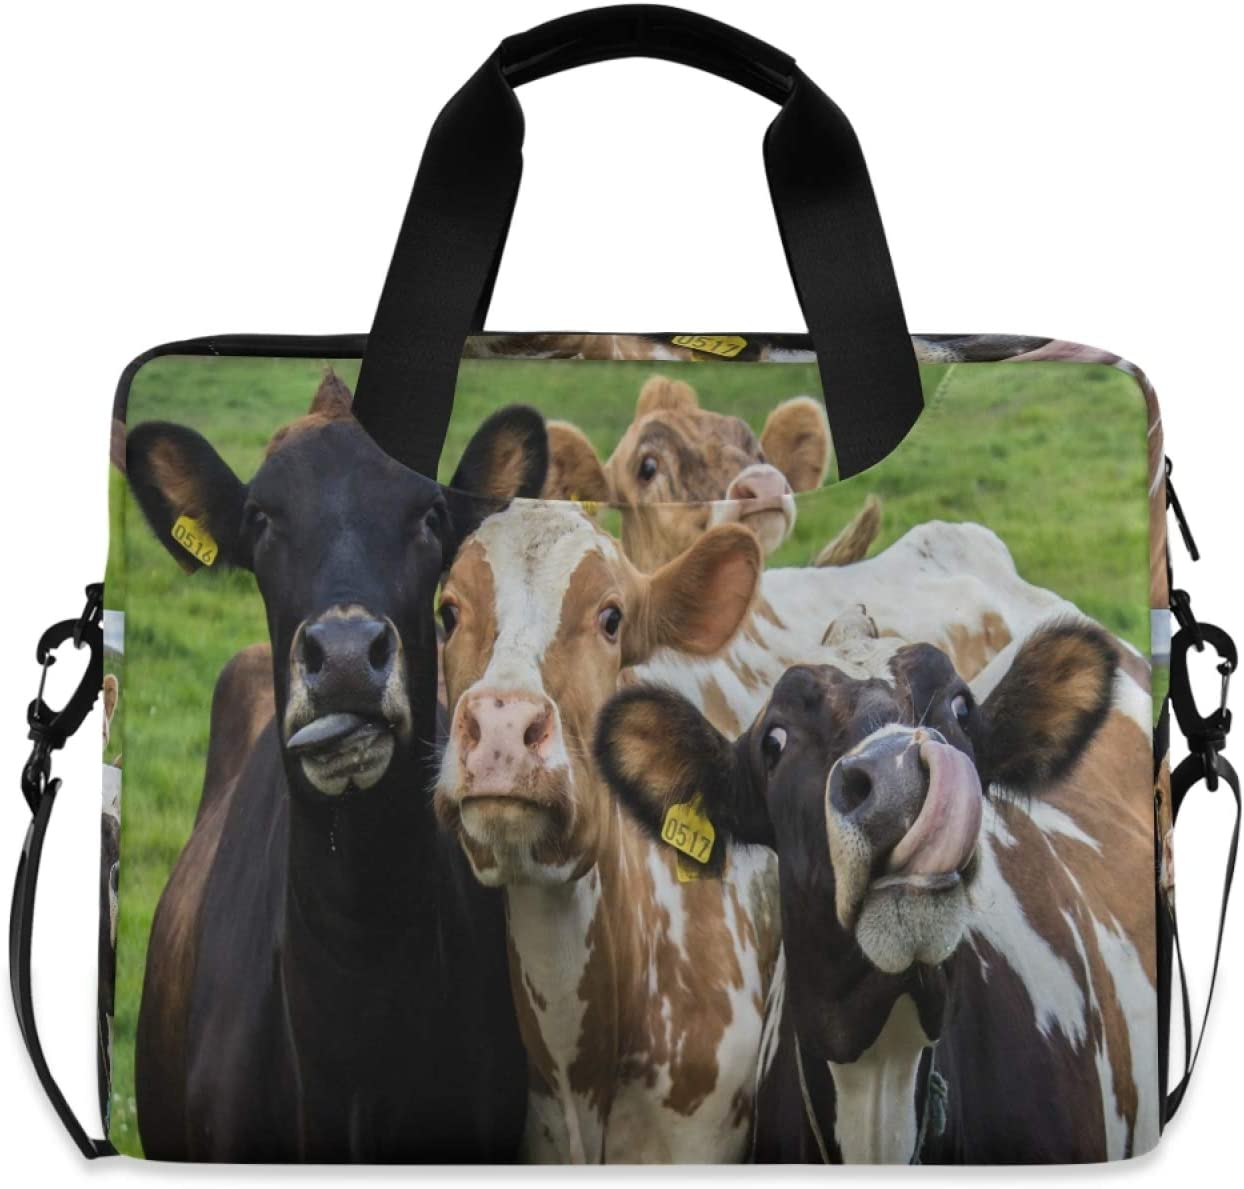 Ombra Omaha Mall Laptop Shoulder Bag Farm Cow Cattle Animal Portable Seasonal Wrap Introduction